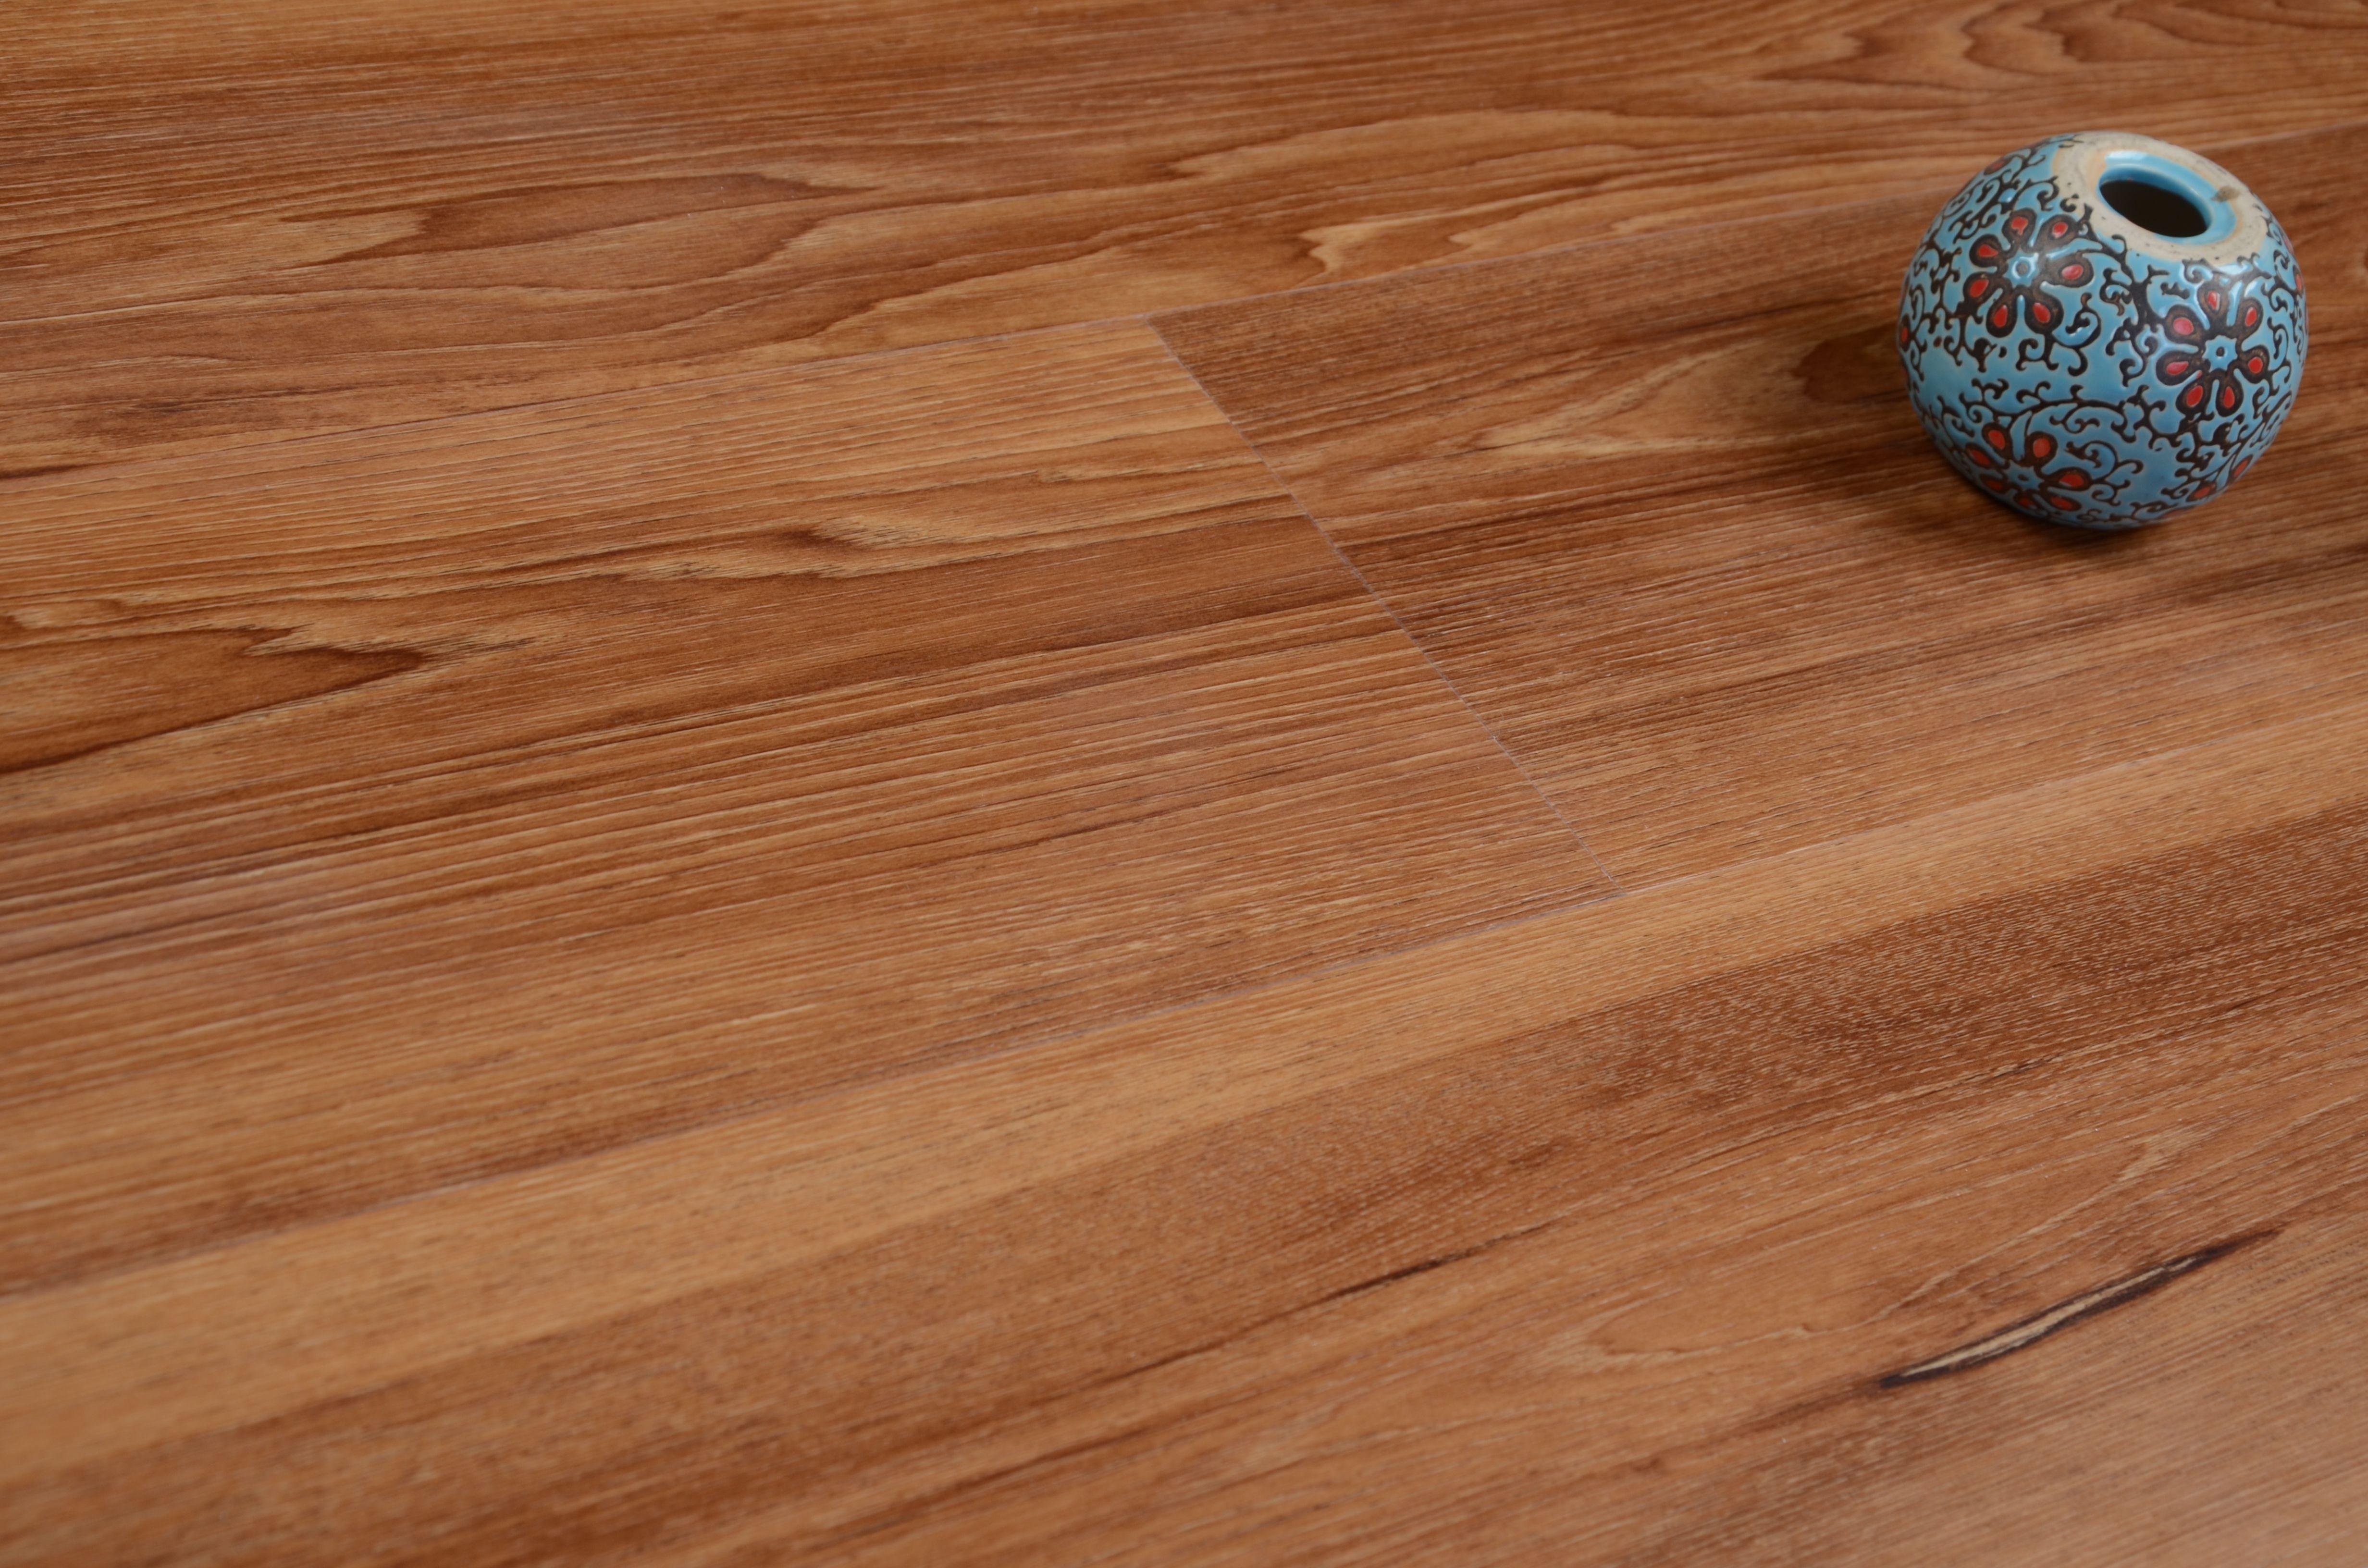 Spc Flooring Is A Brand New Product From Vinyl Flooing 100 Waterproof Higher Skid Resistance Wear Layer This Makes Sp Vinyl Flooring Vinyl Plank Flooring